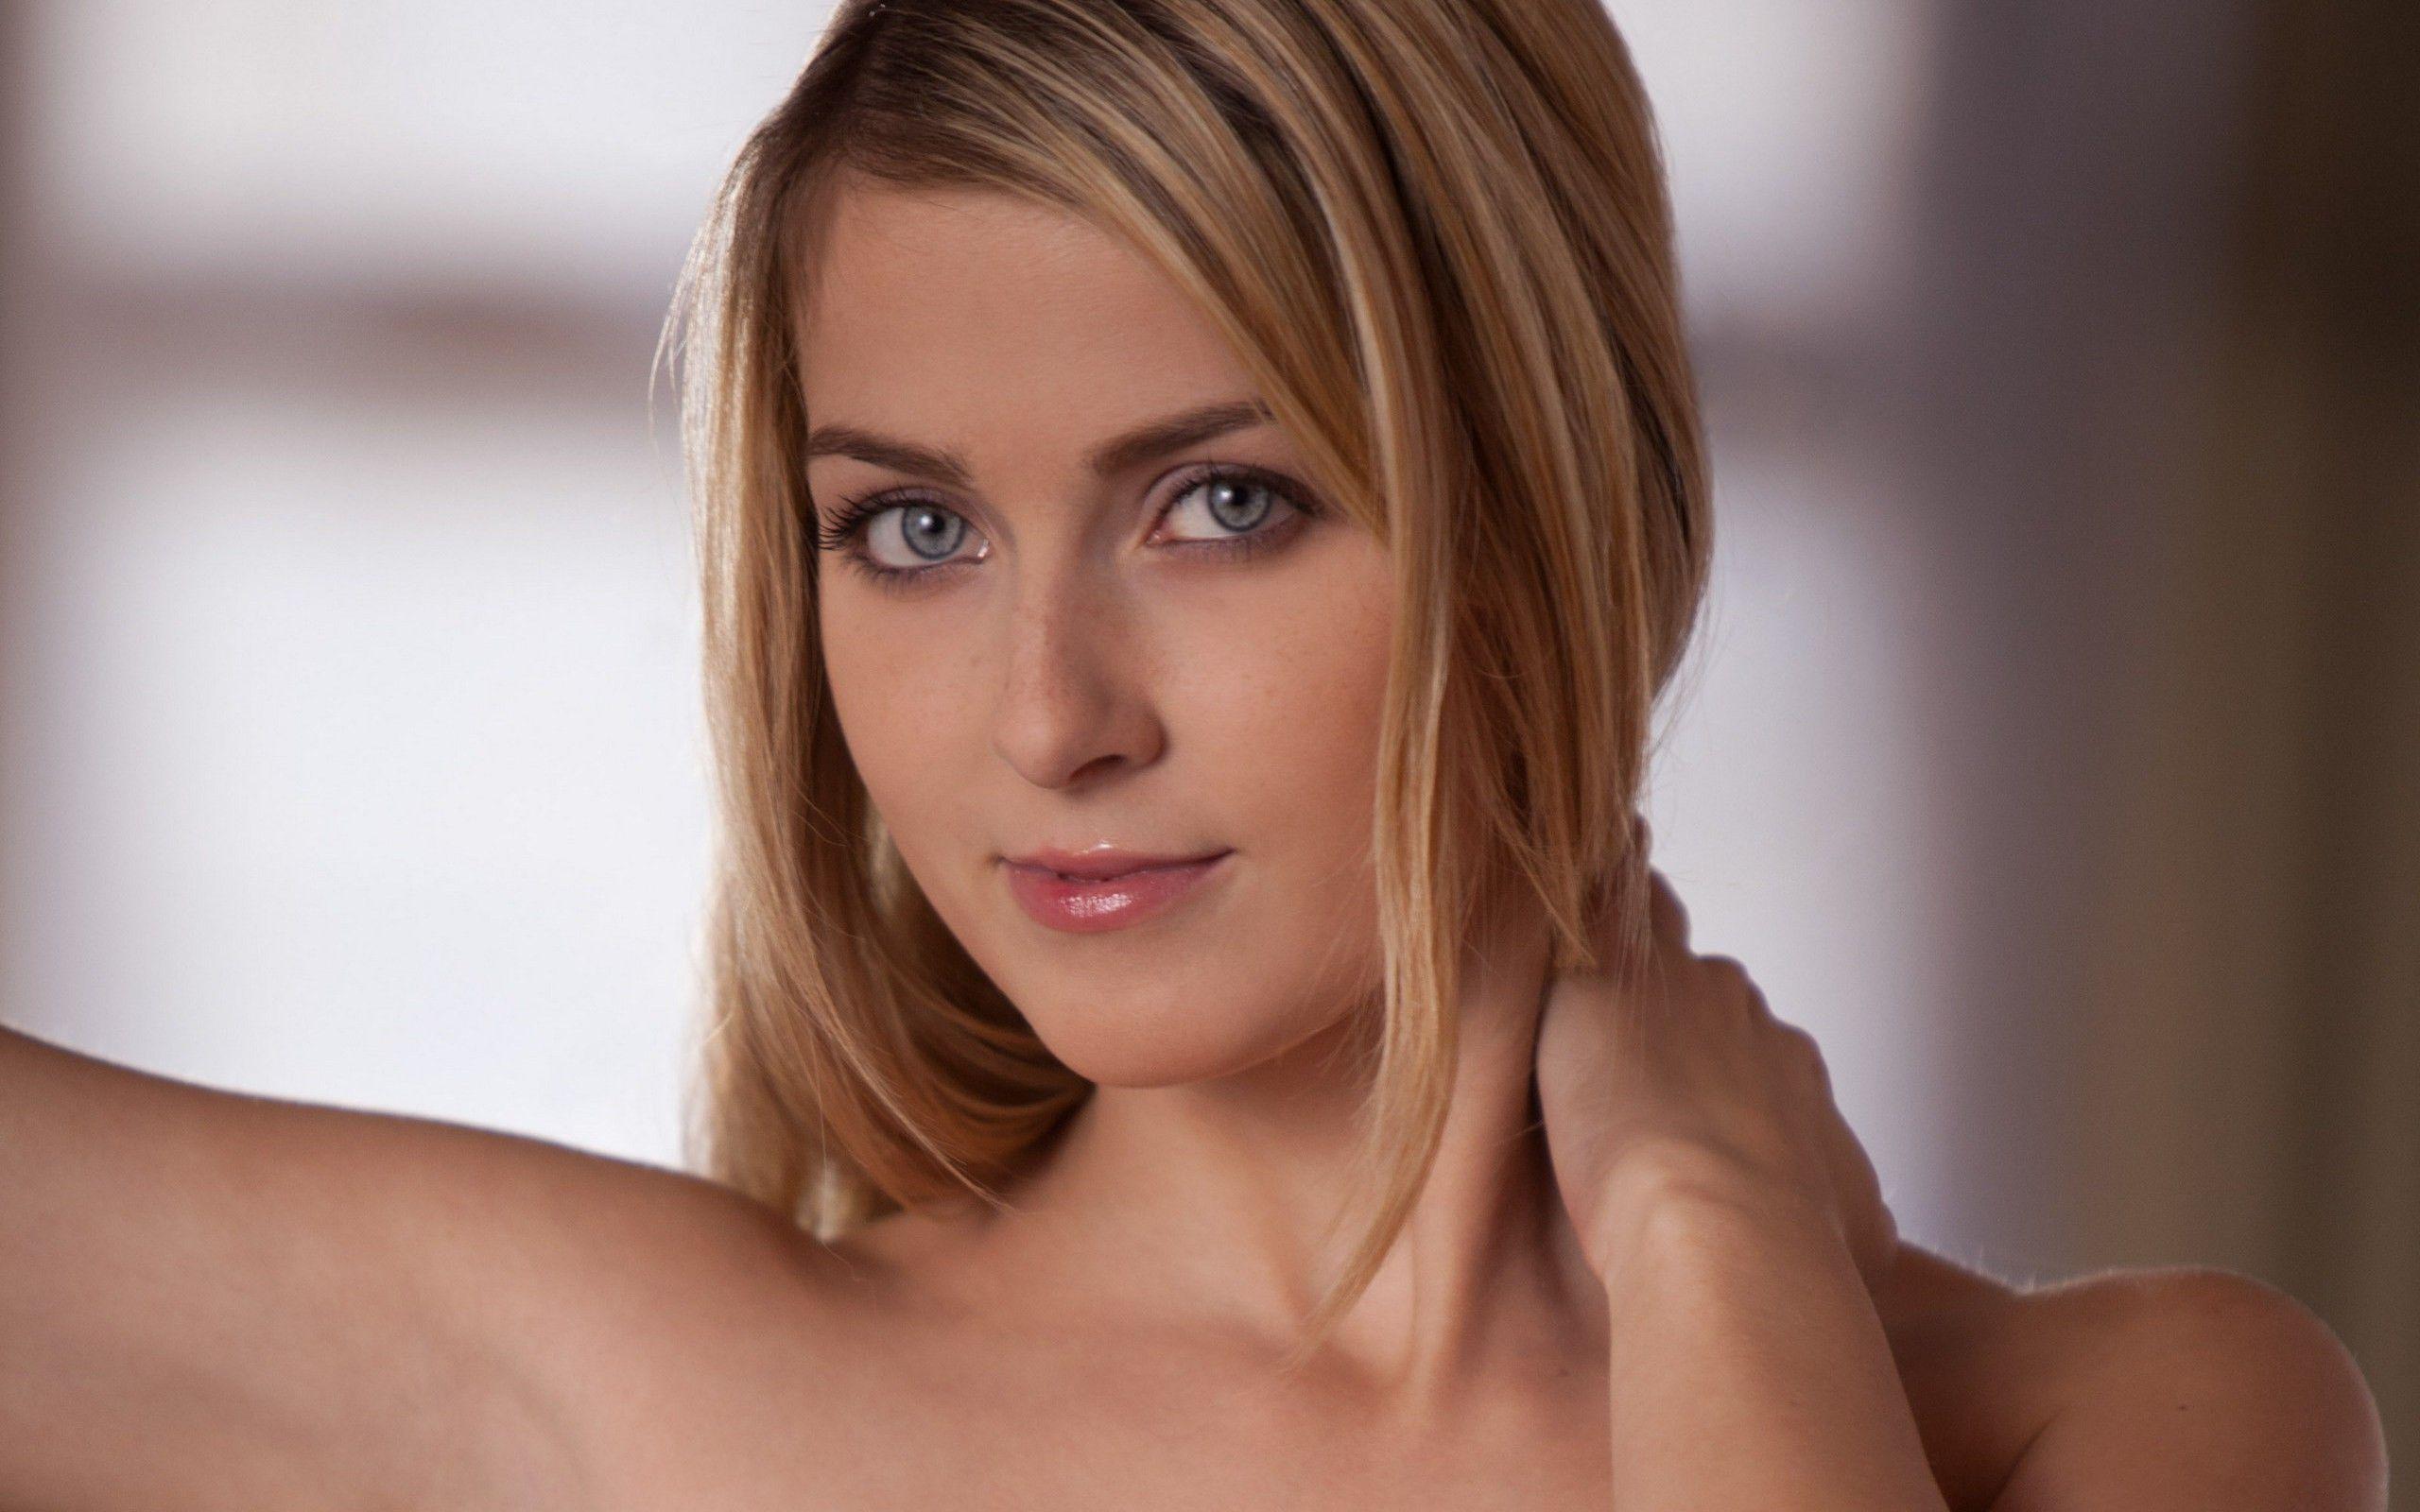 Naked bulgarian women nude beach